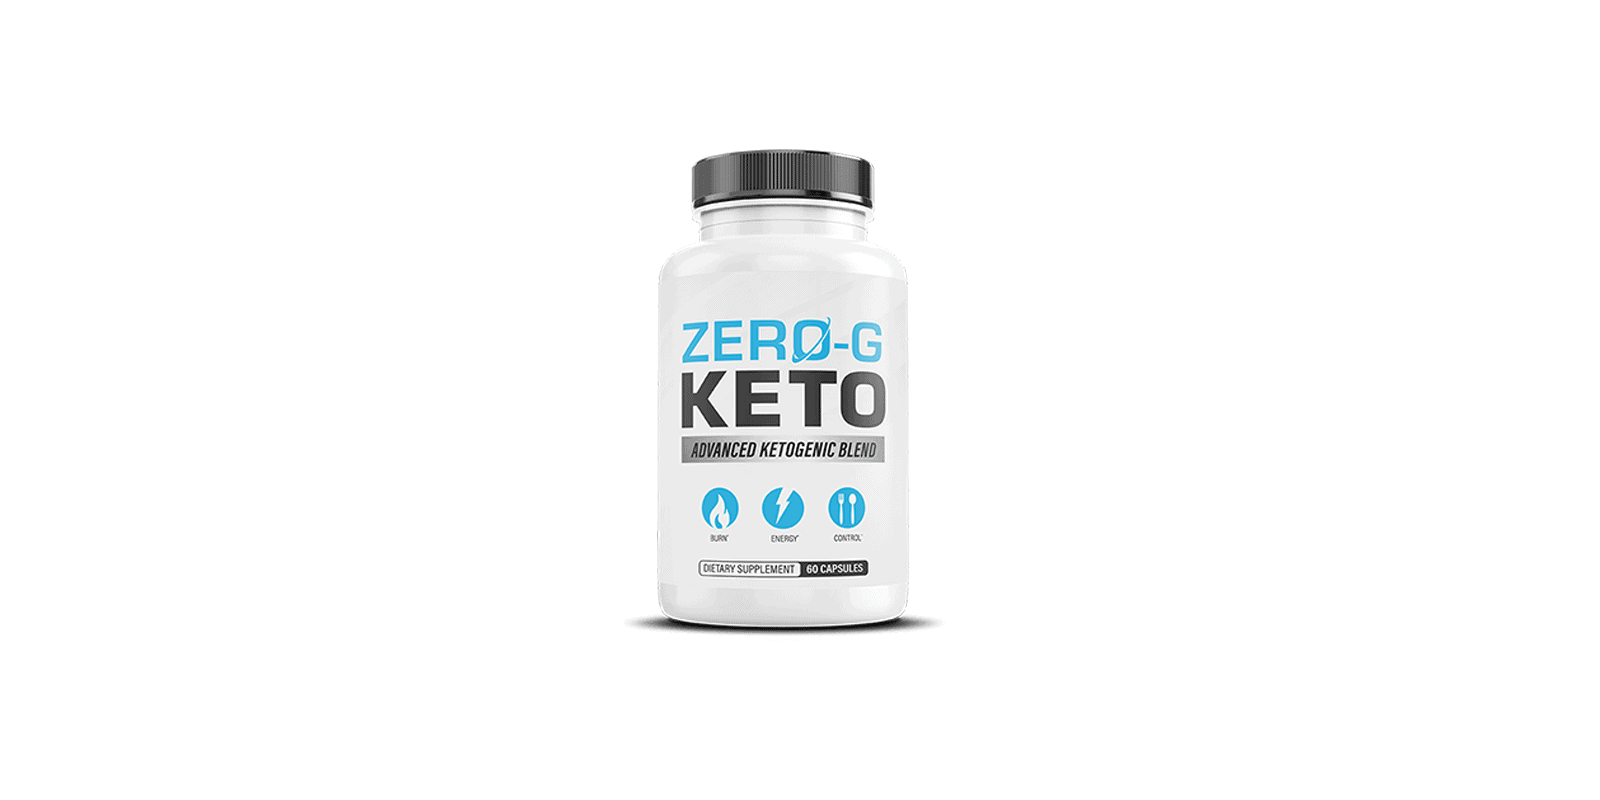 Zero-G Keto reviews